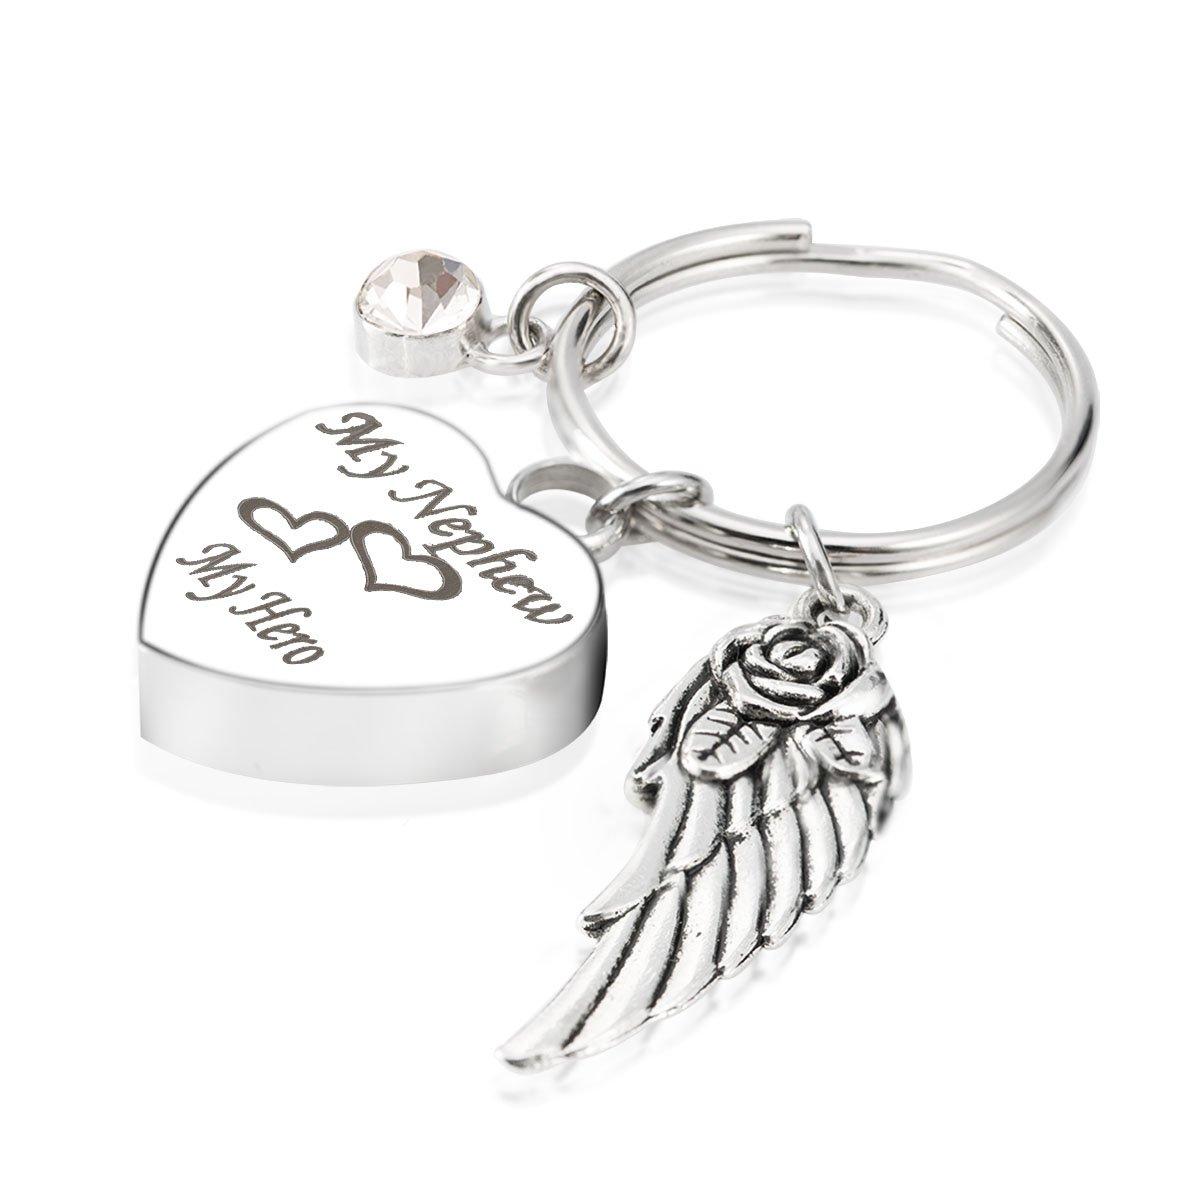 YIKOXI Women/'s Stainless Steel Simple Infinity Bracelet Mother Girl Friendship Bracelet,6.7-9.2 Inch